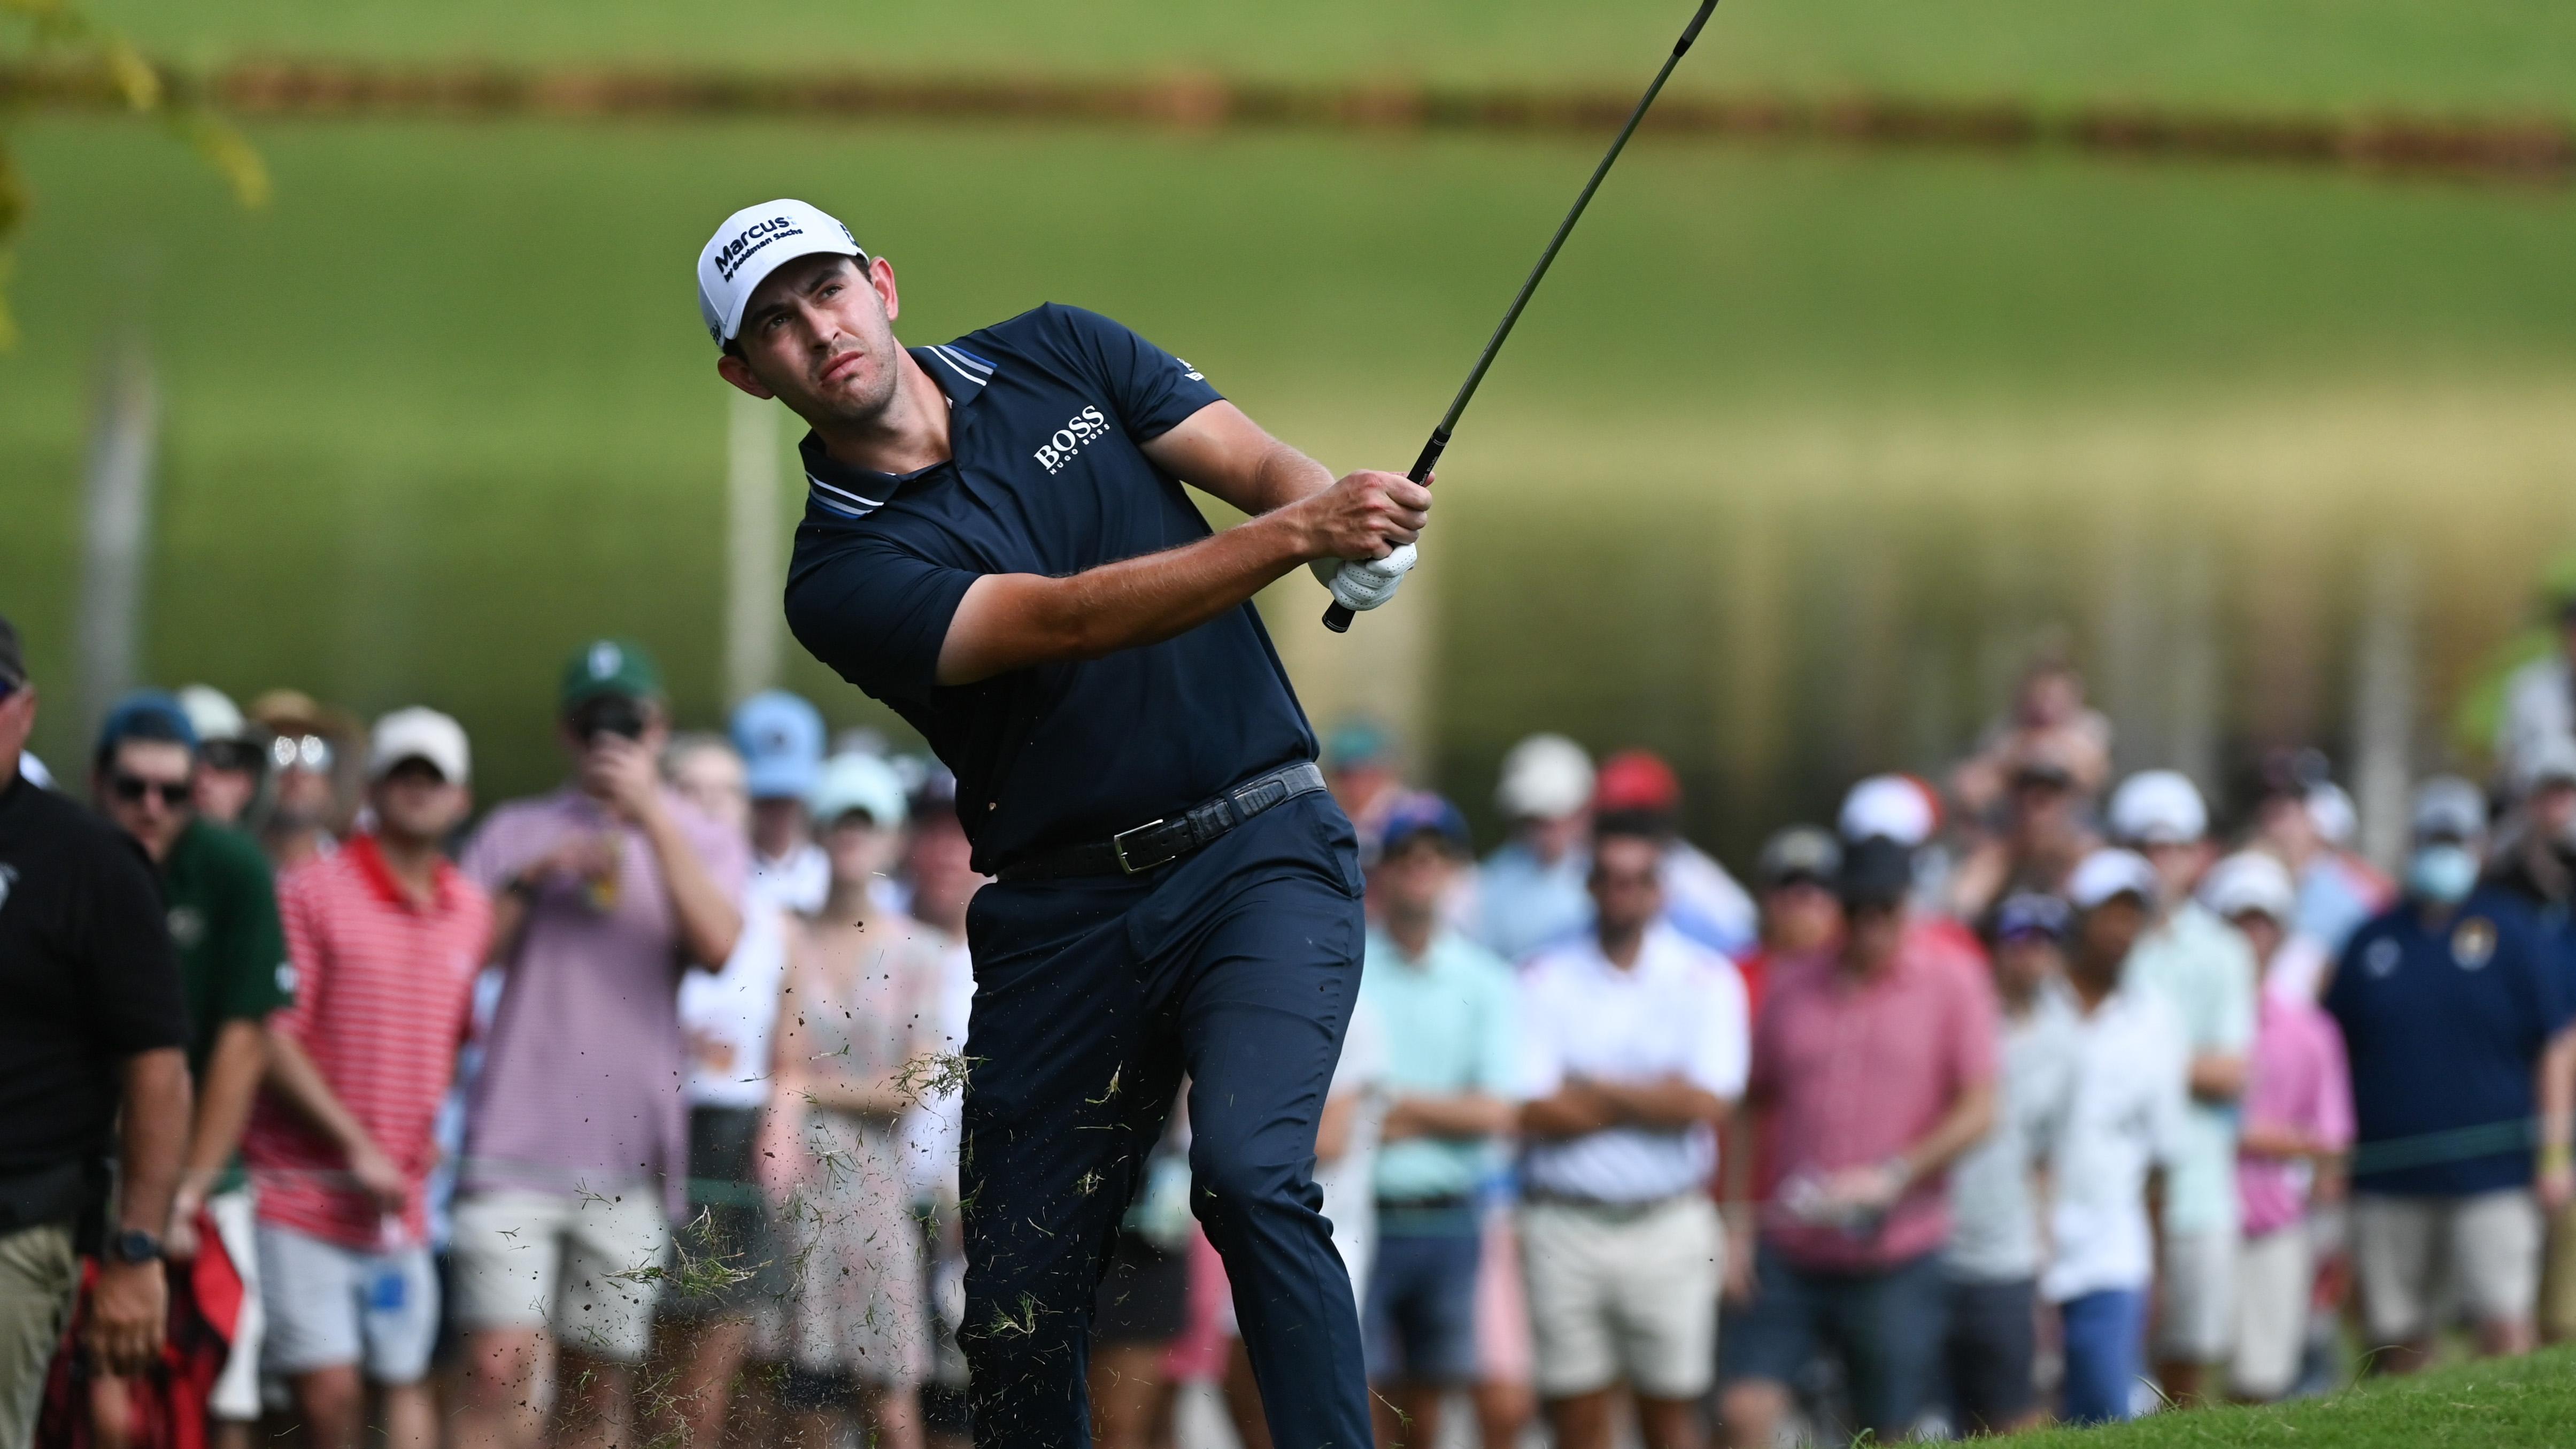 Patrick Cantlay Wins PGA Tour Player of the Year Award Over Jon Rahm